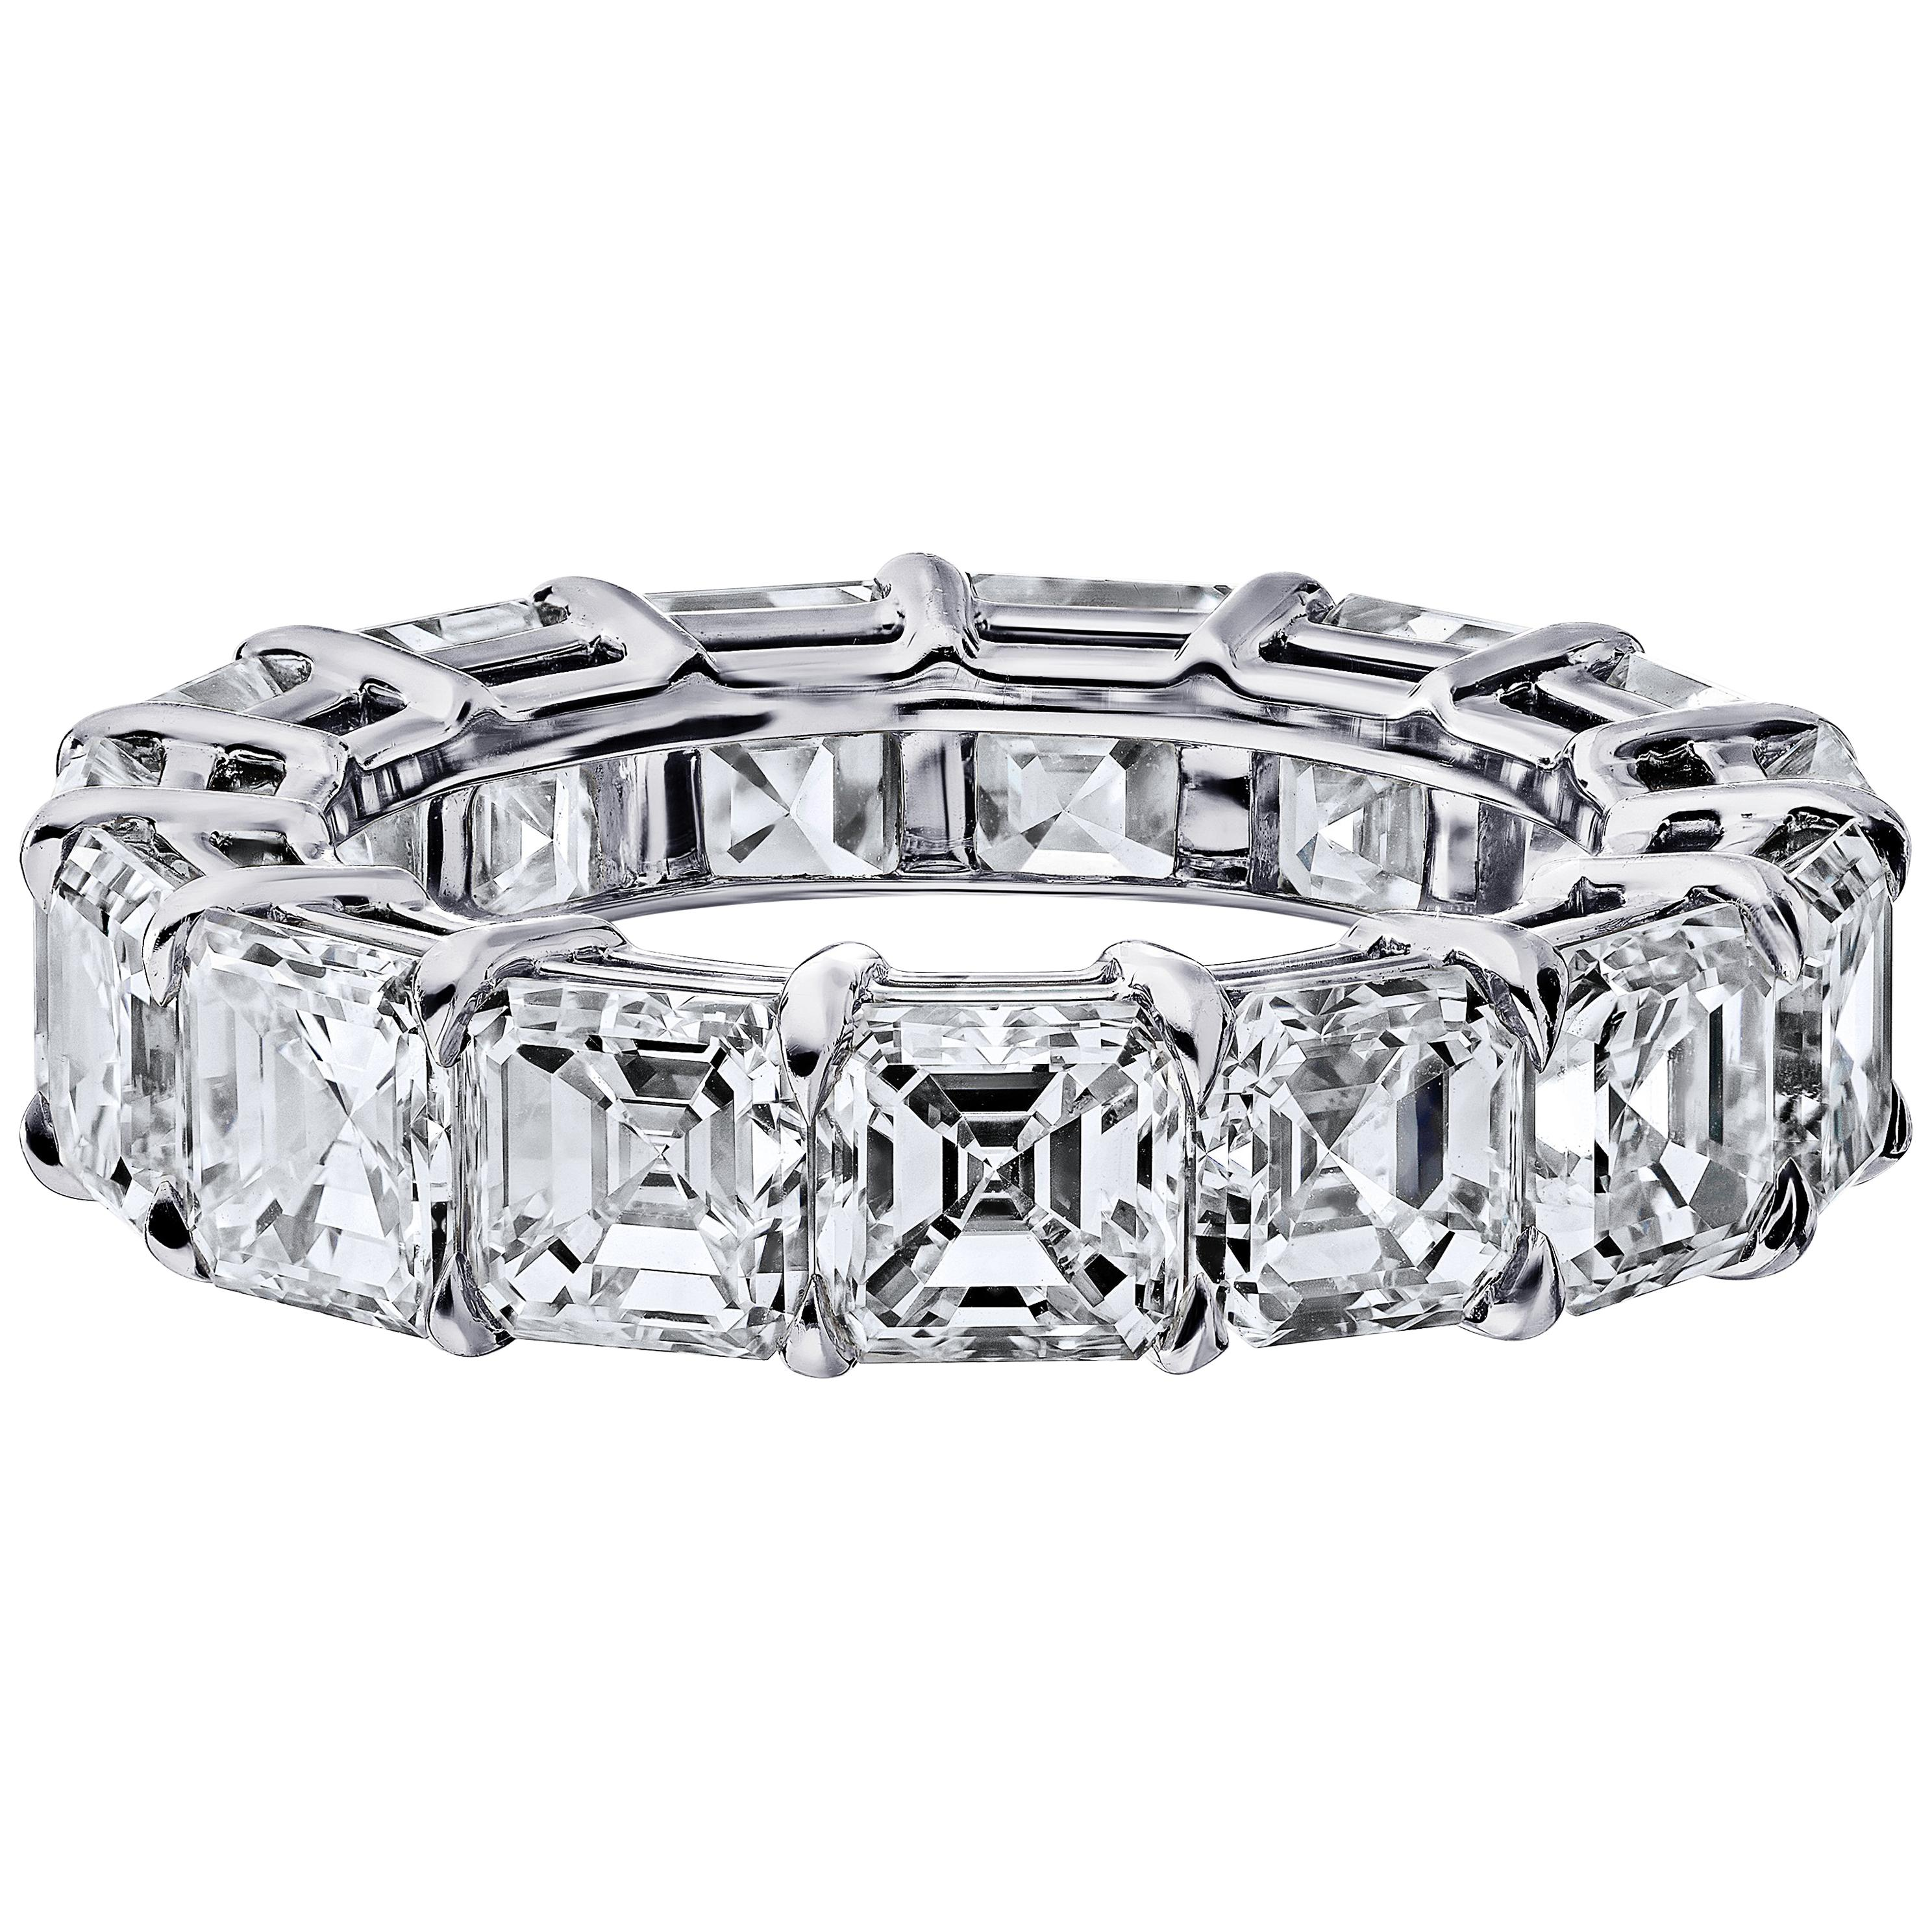 GIA Certified Asher Cut 6.50 Carat Diamond Ring Platinum Eternity Band